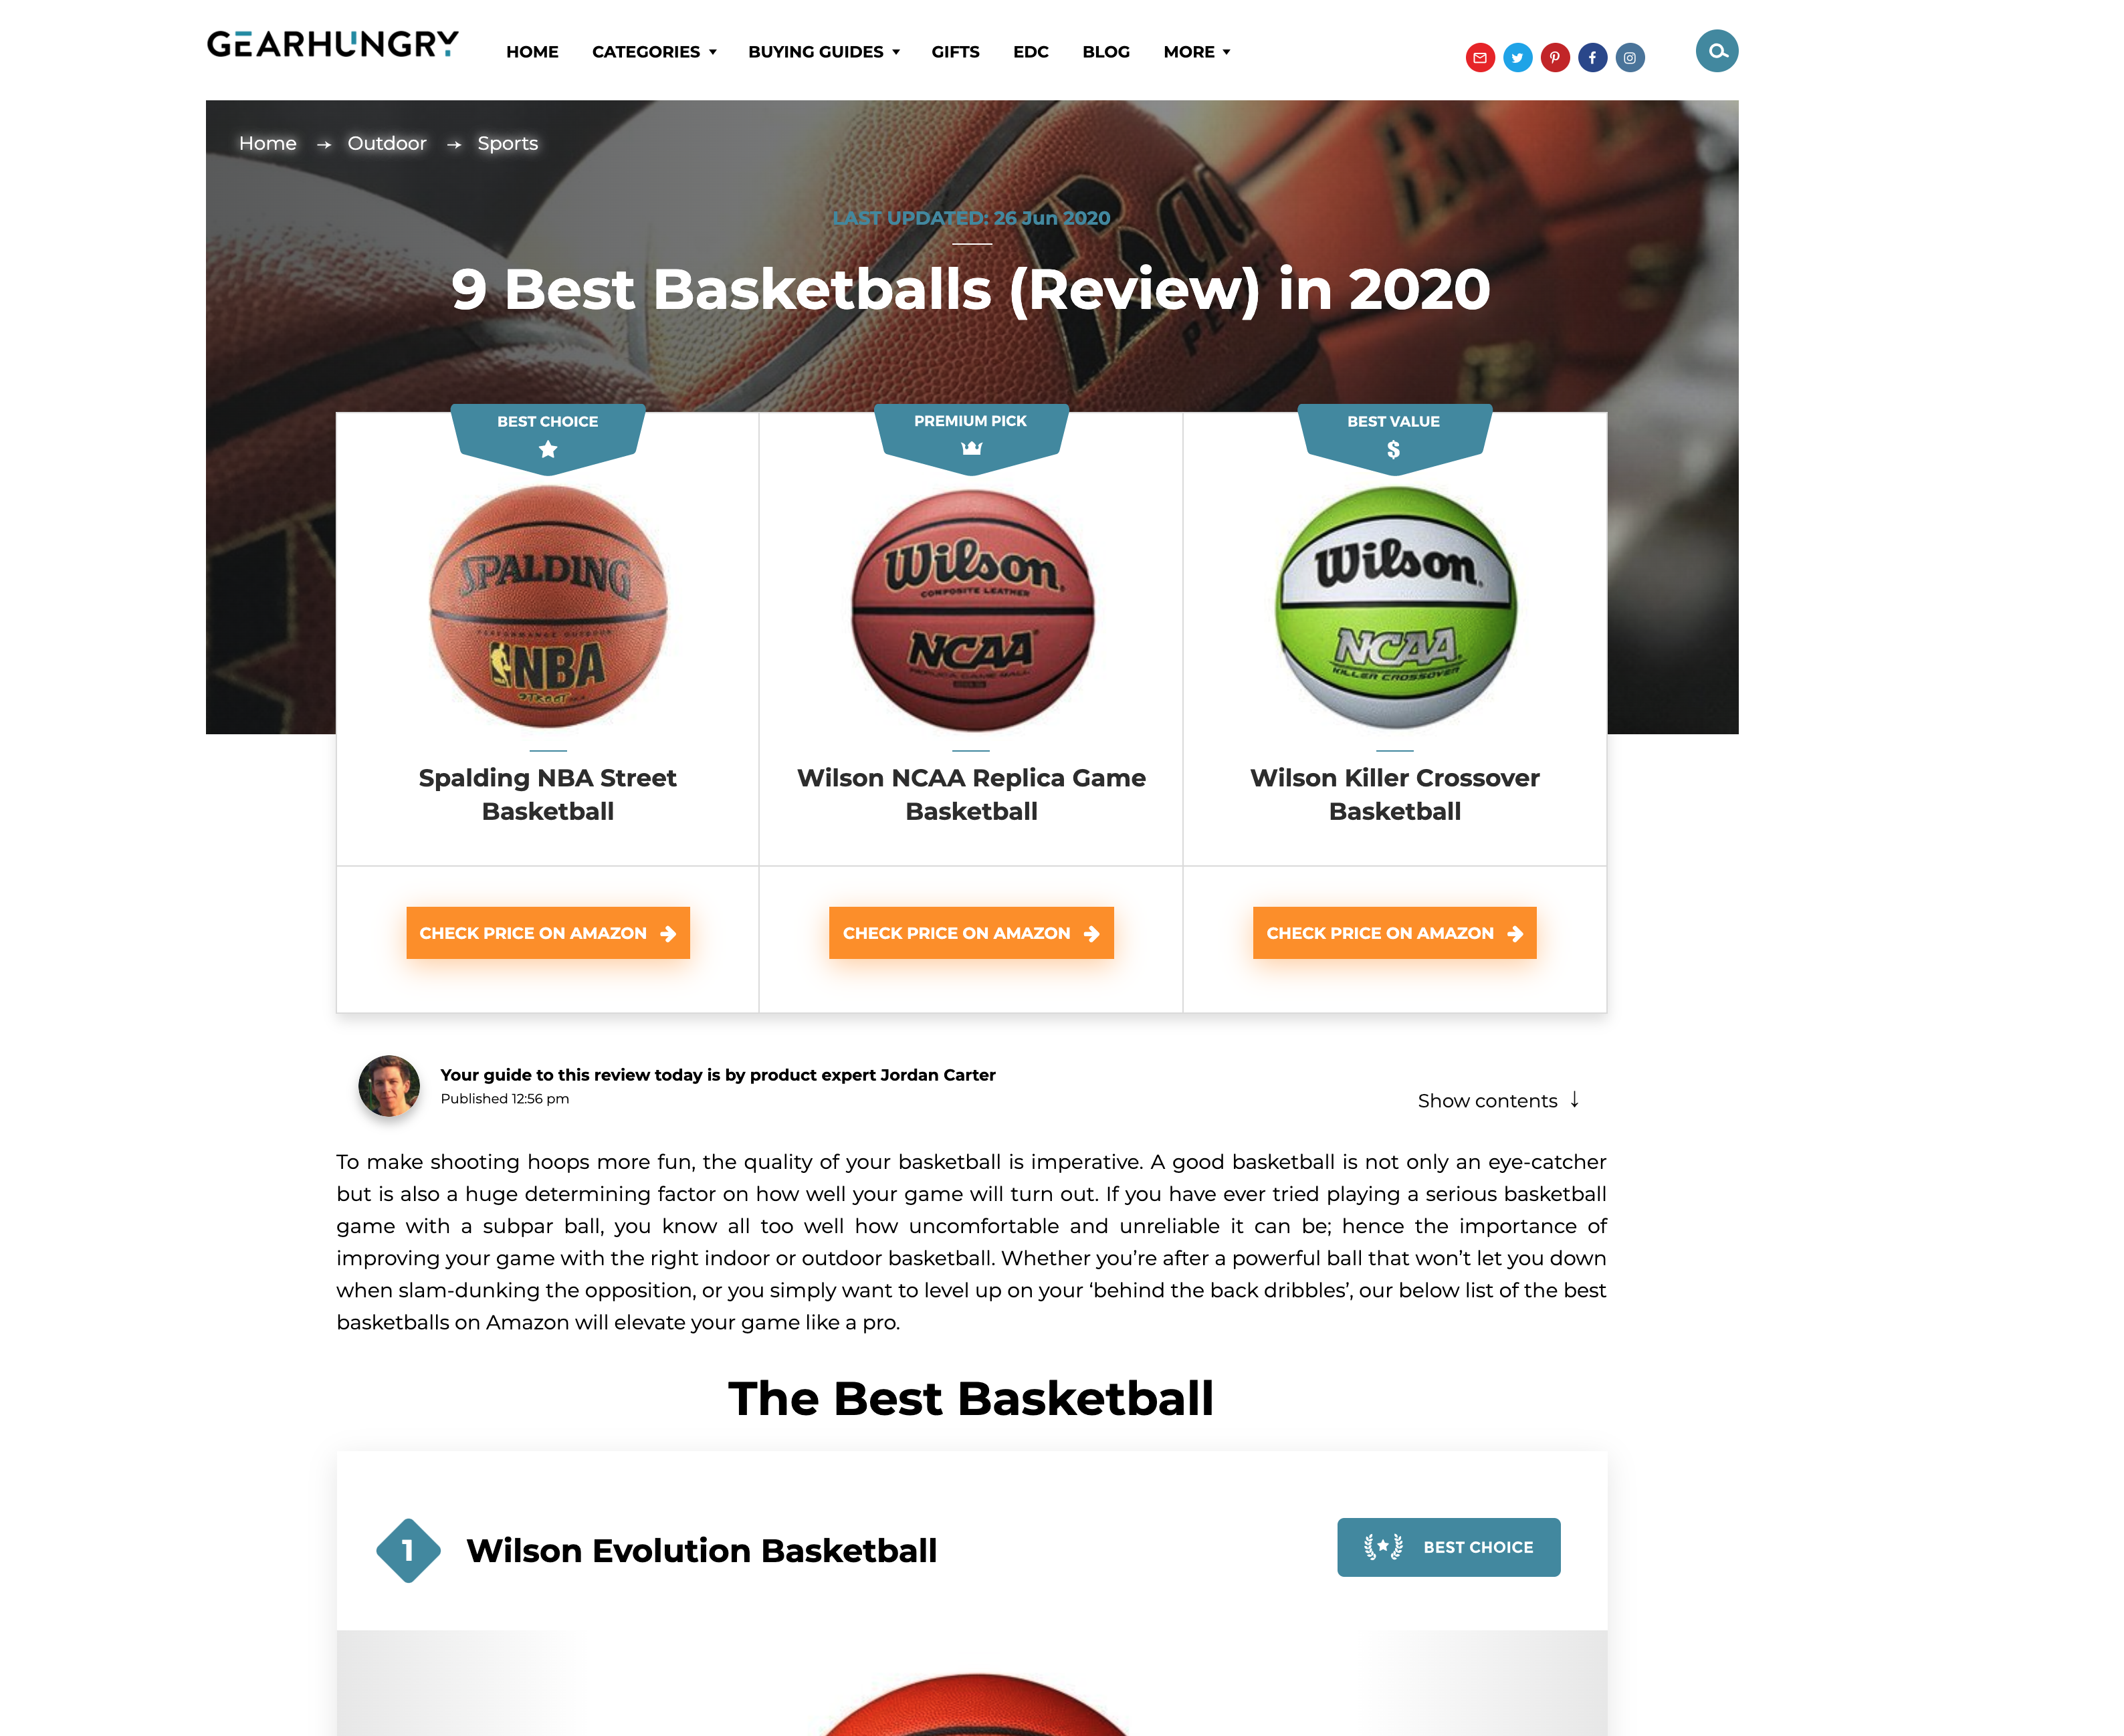 GearHungry 9 Best Basketballs buying guide screenshot